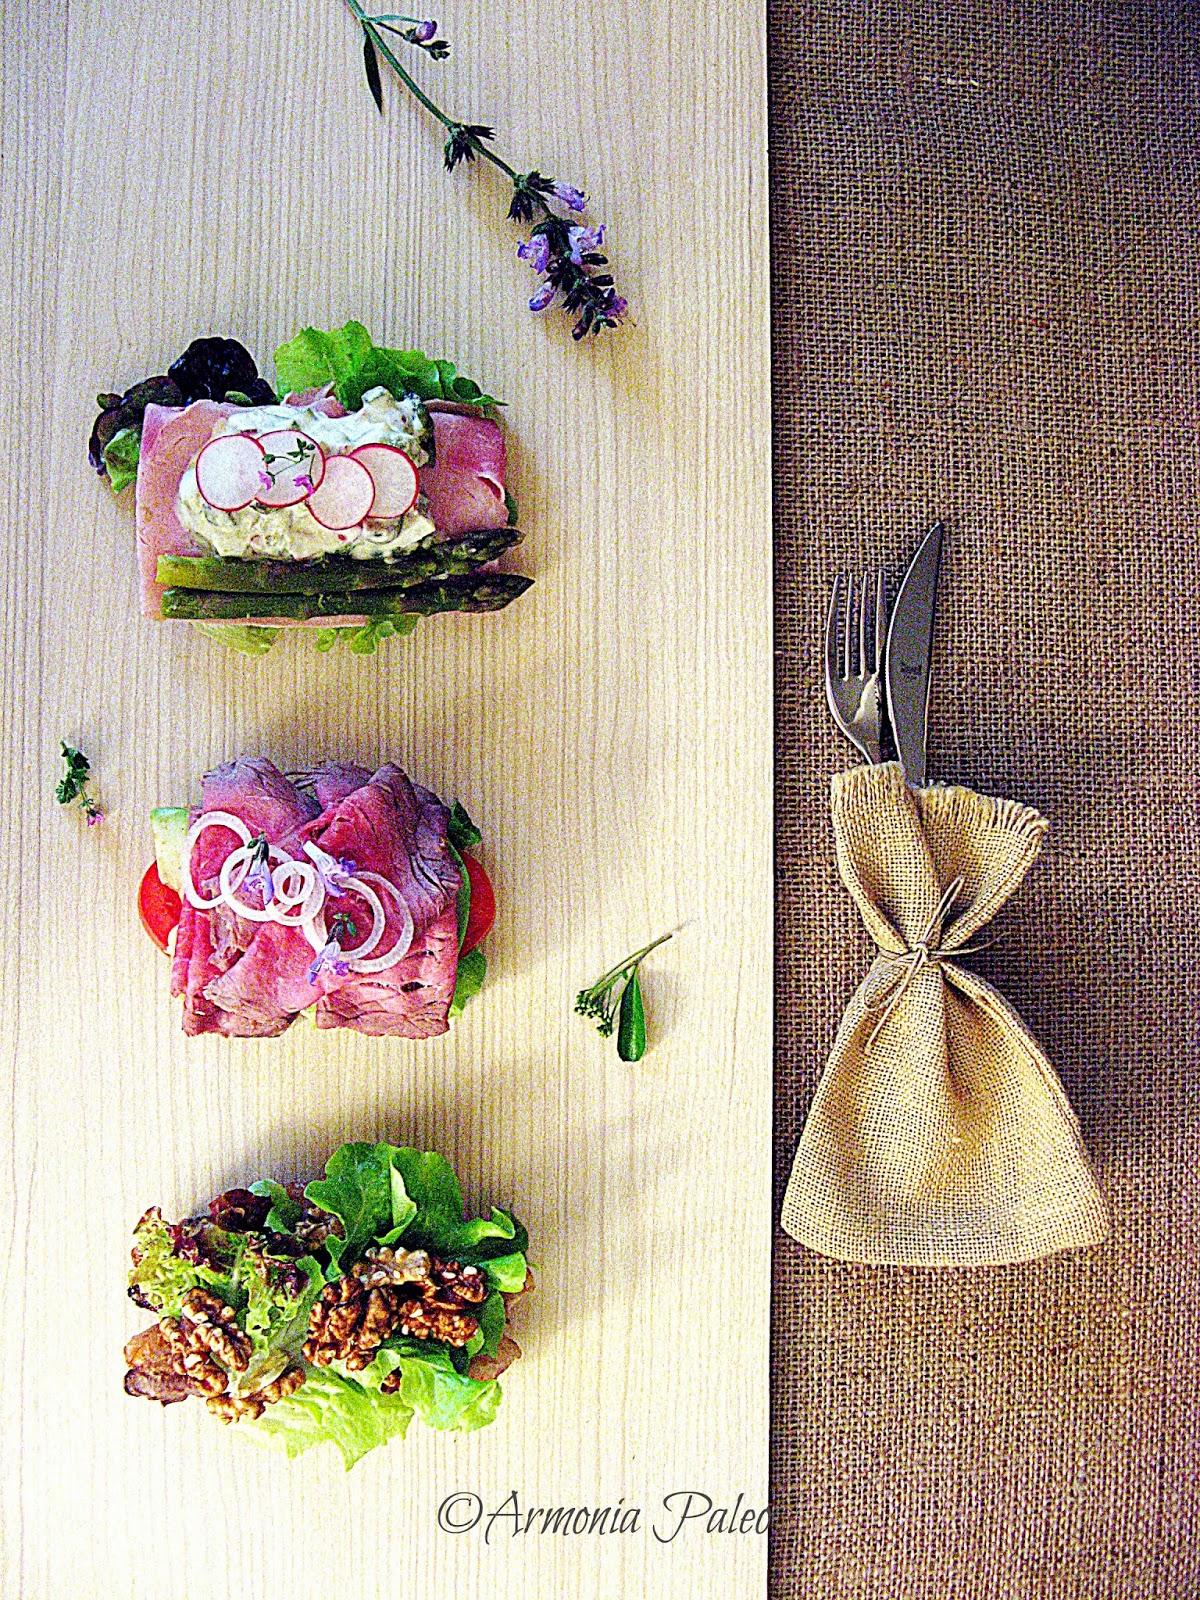 Smørrebrød - Panino Aperto Danese con Carne di Armonia Paleo